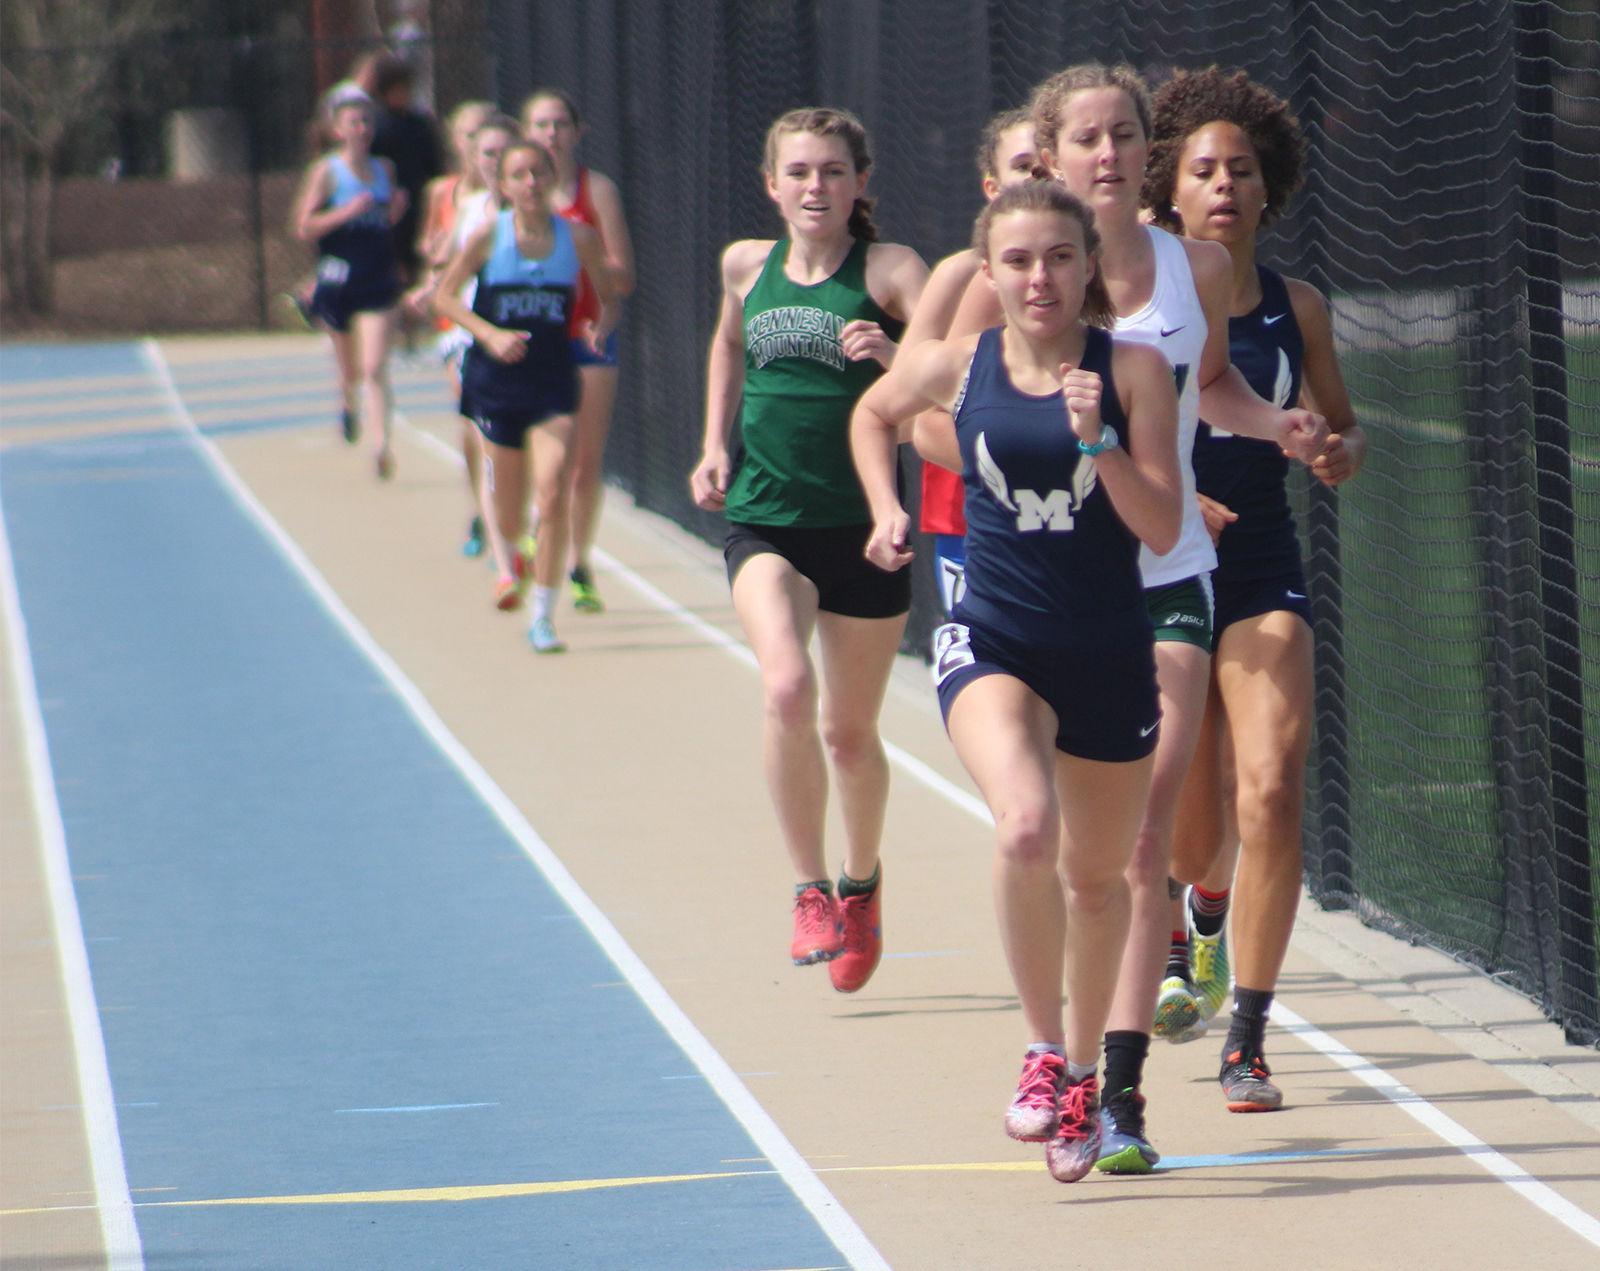 Marietta girls track team sets sights on state championship repeat